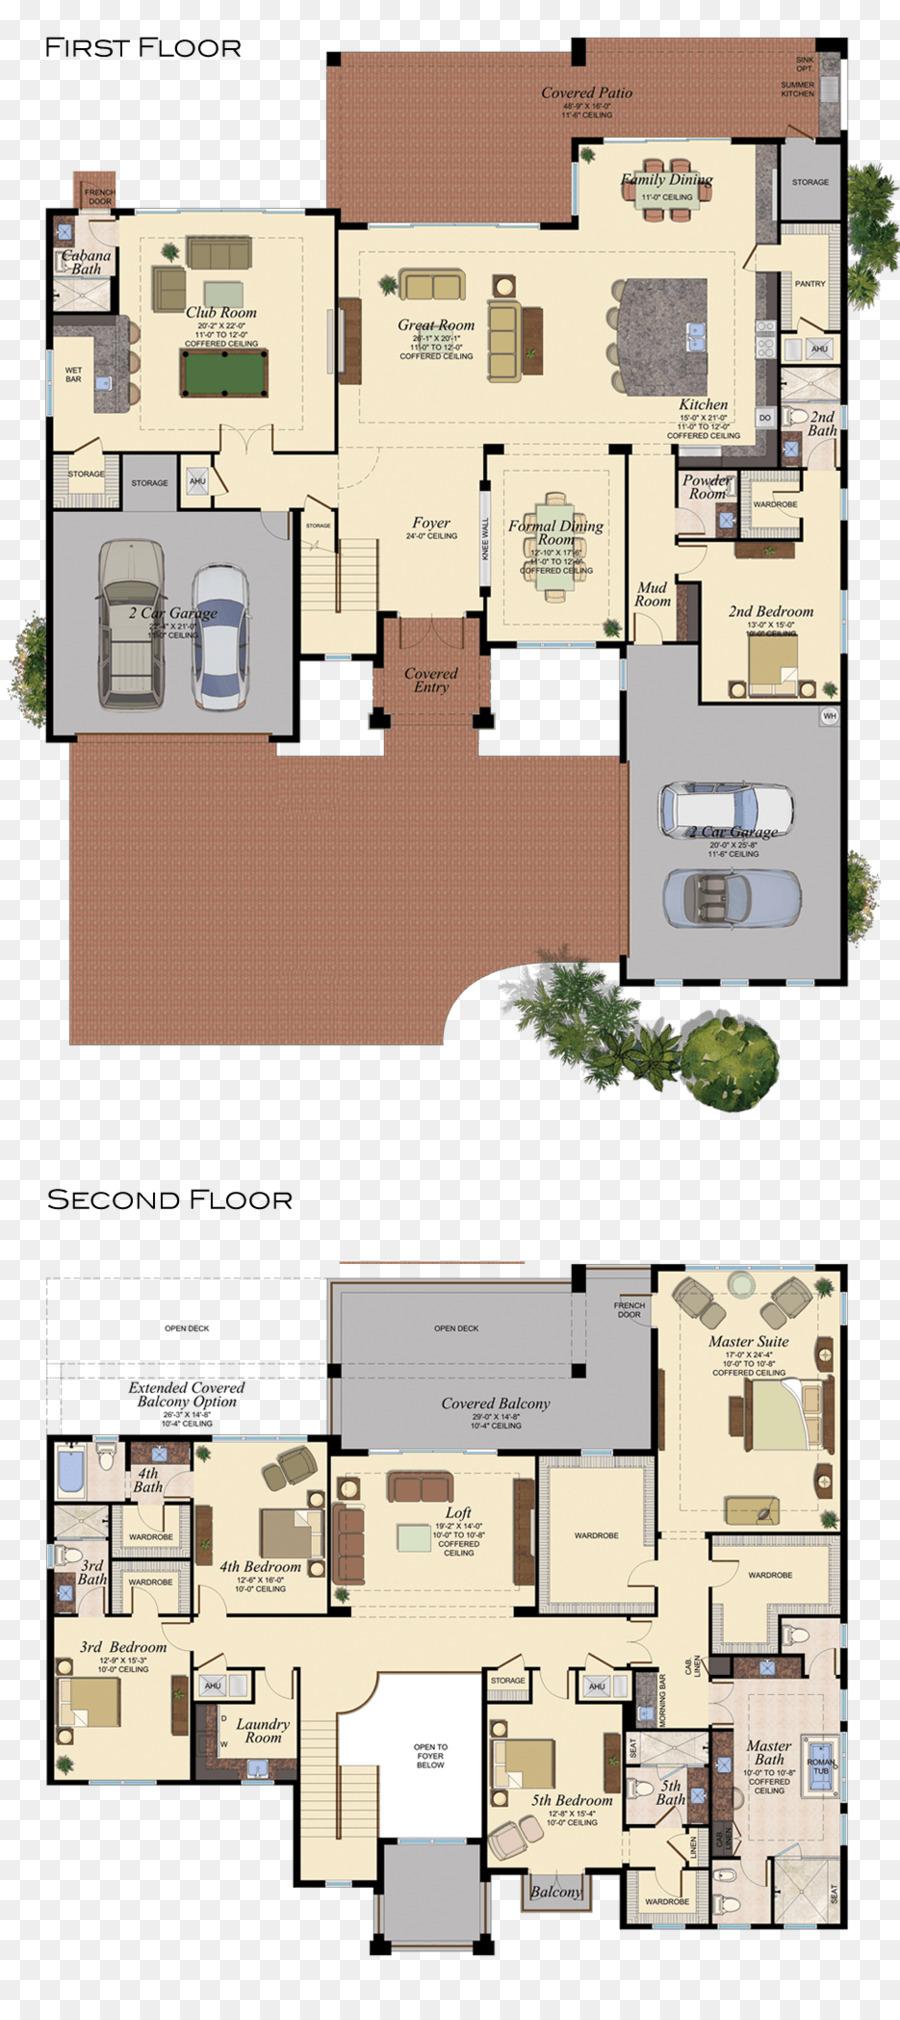 Floor Plan House Plan Interior Design Services Architecture   House